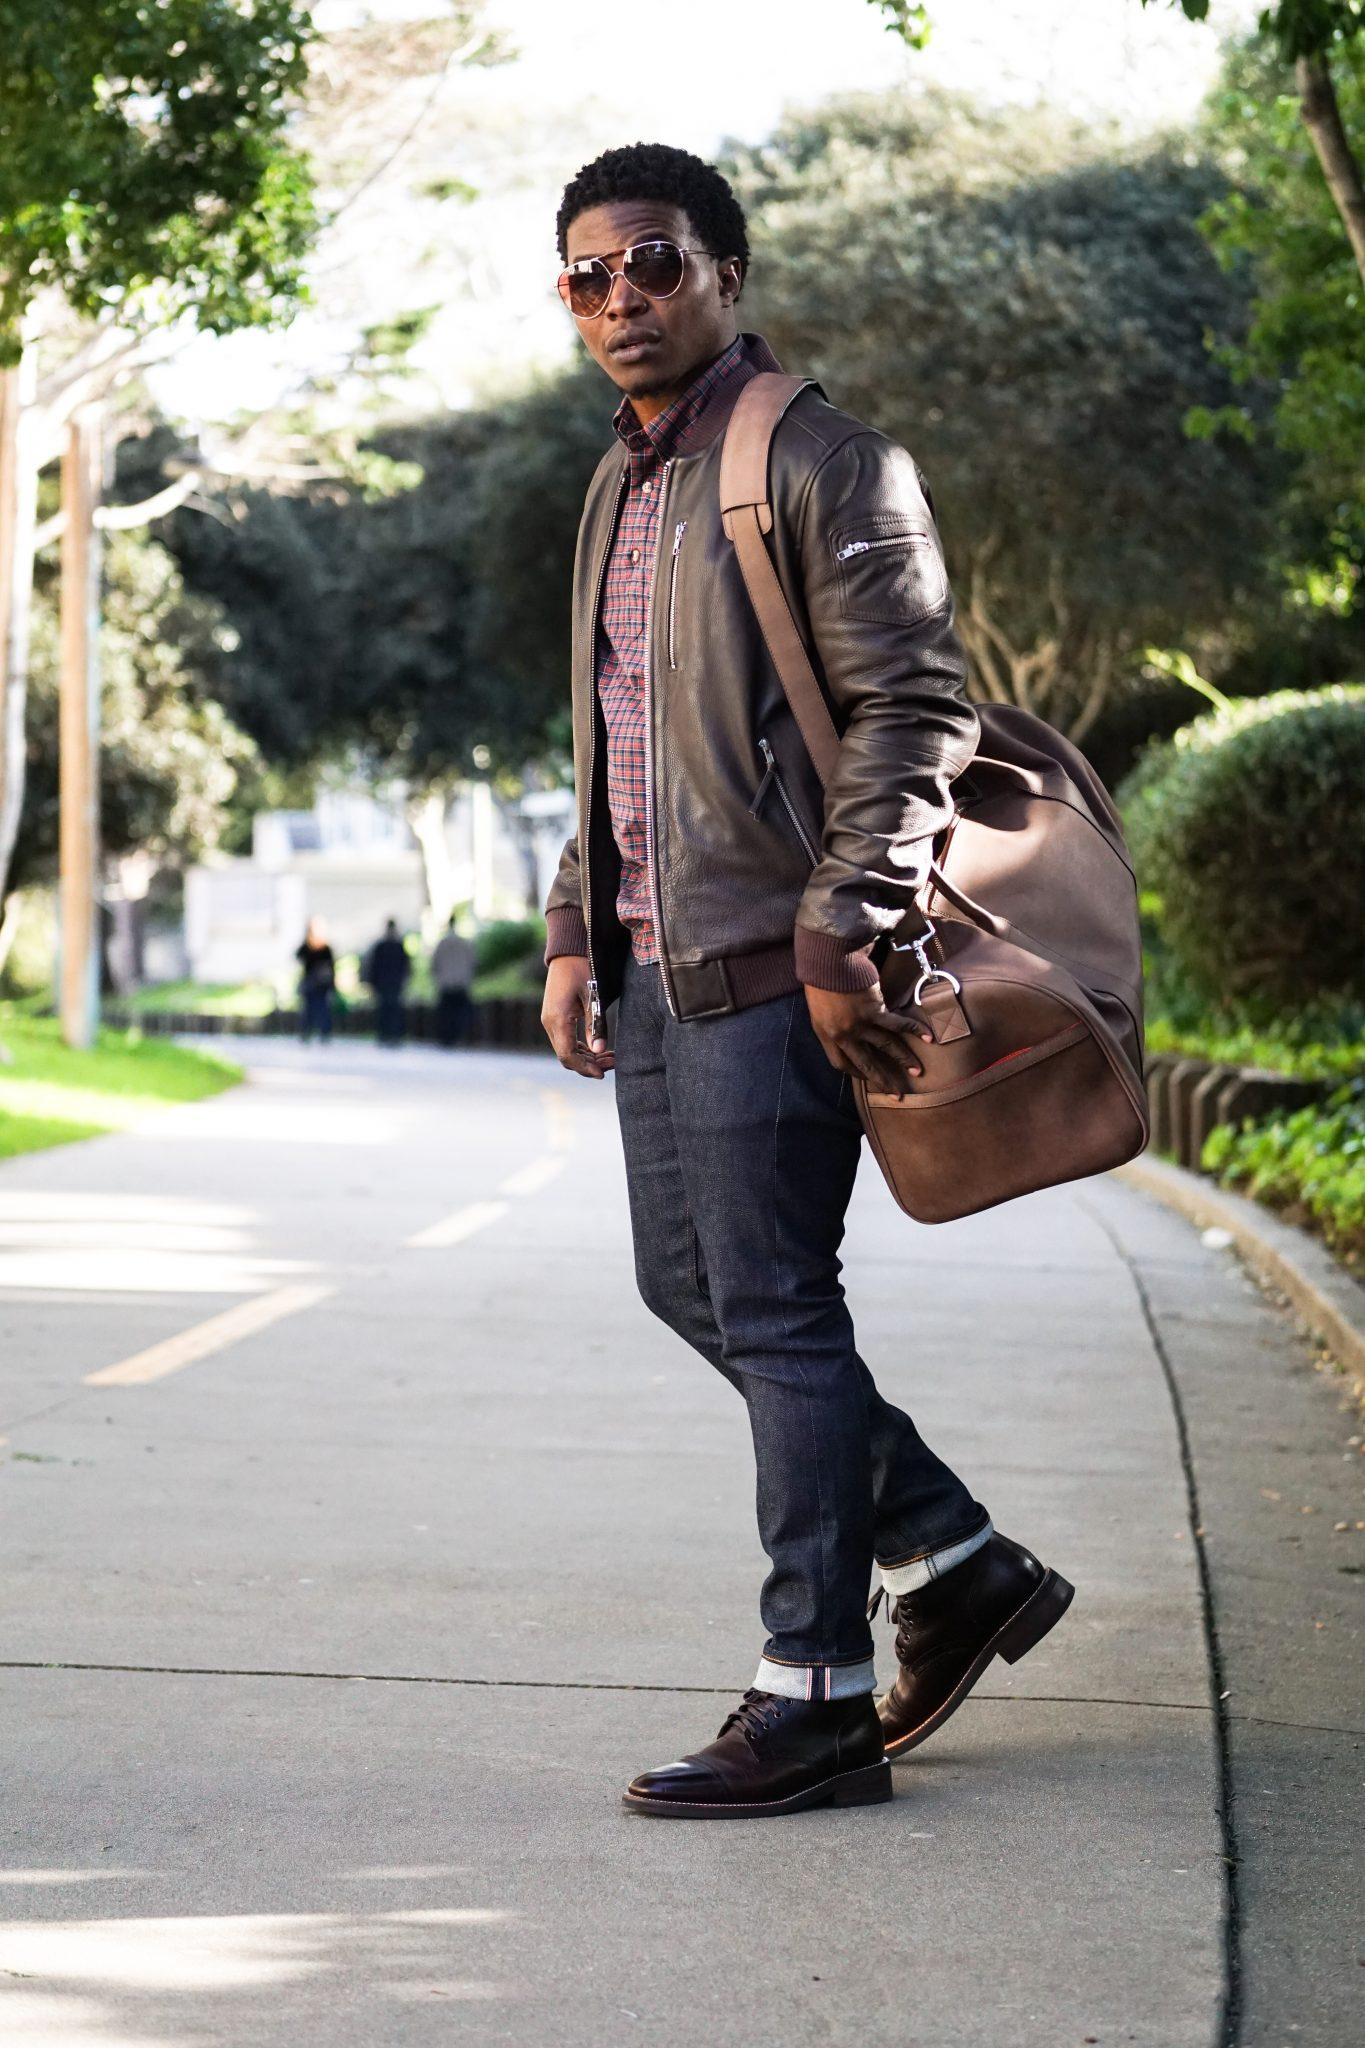 dapper-advisor-black-man-wearing-brown-leather-bomber-jacket-holding-brown-leather duffle bag-3